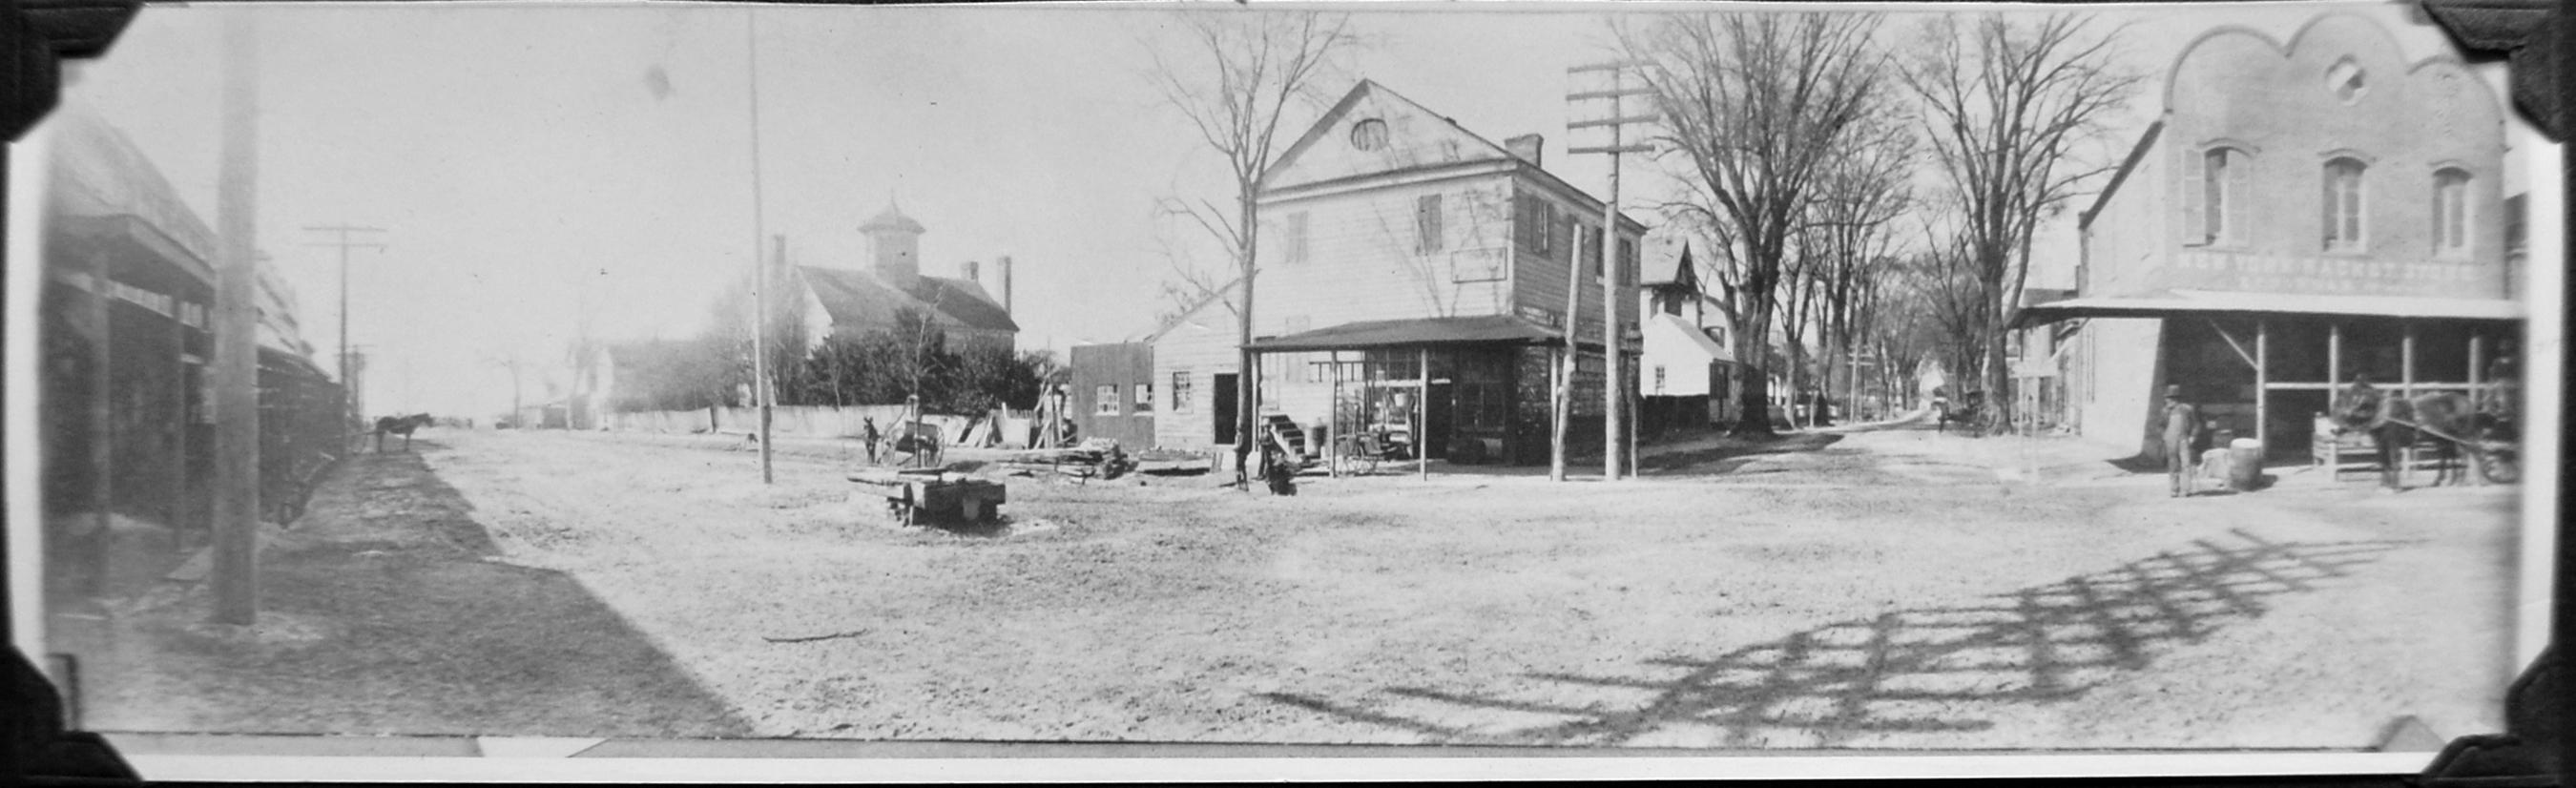 PNC Bank Album of Historical Edenton Pictures – Edenton Historical ...